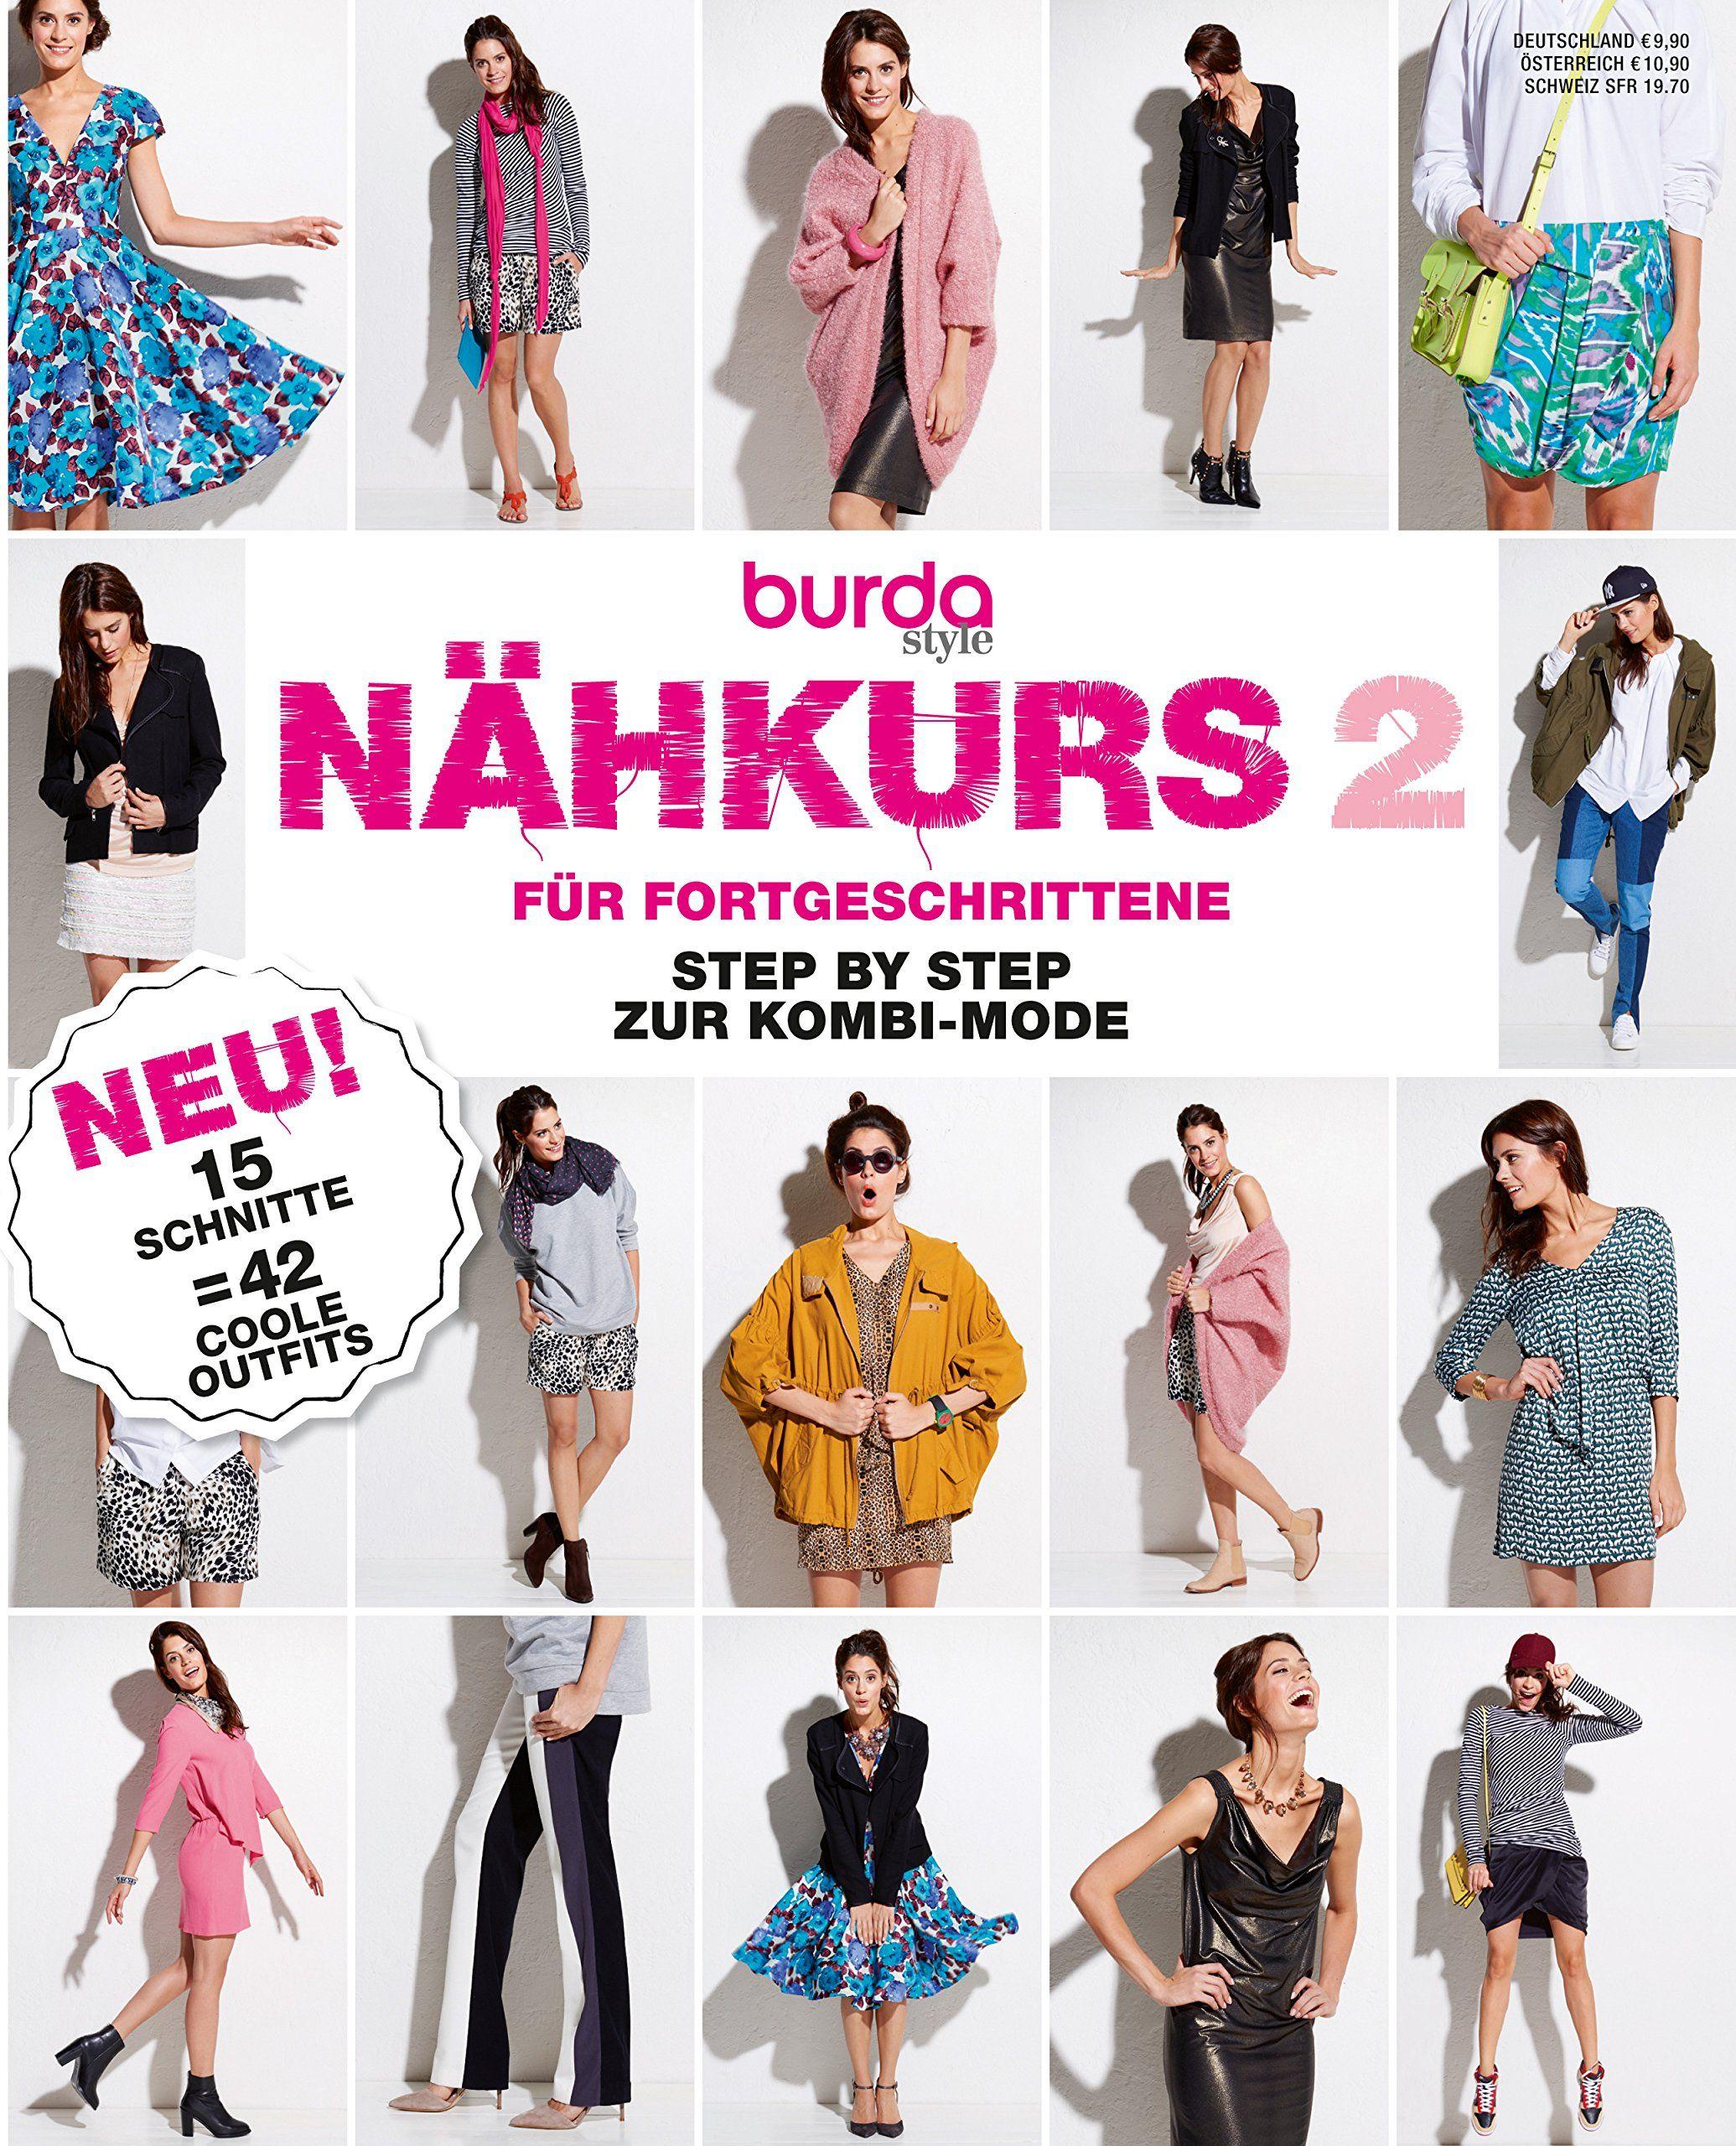 burda Schnittmuster Nähkurs für Fortgeschrittene: Amazon.de: Burda ...